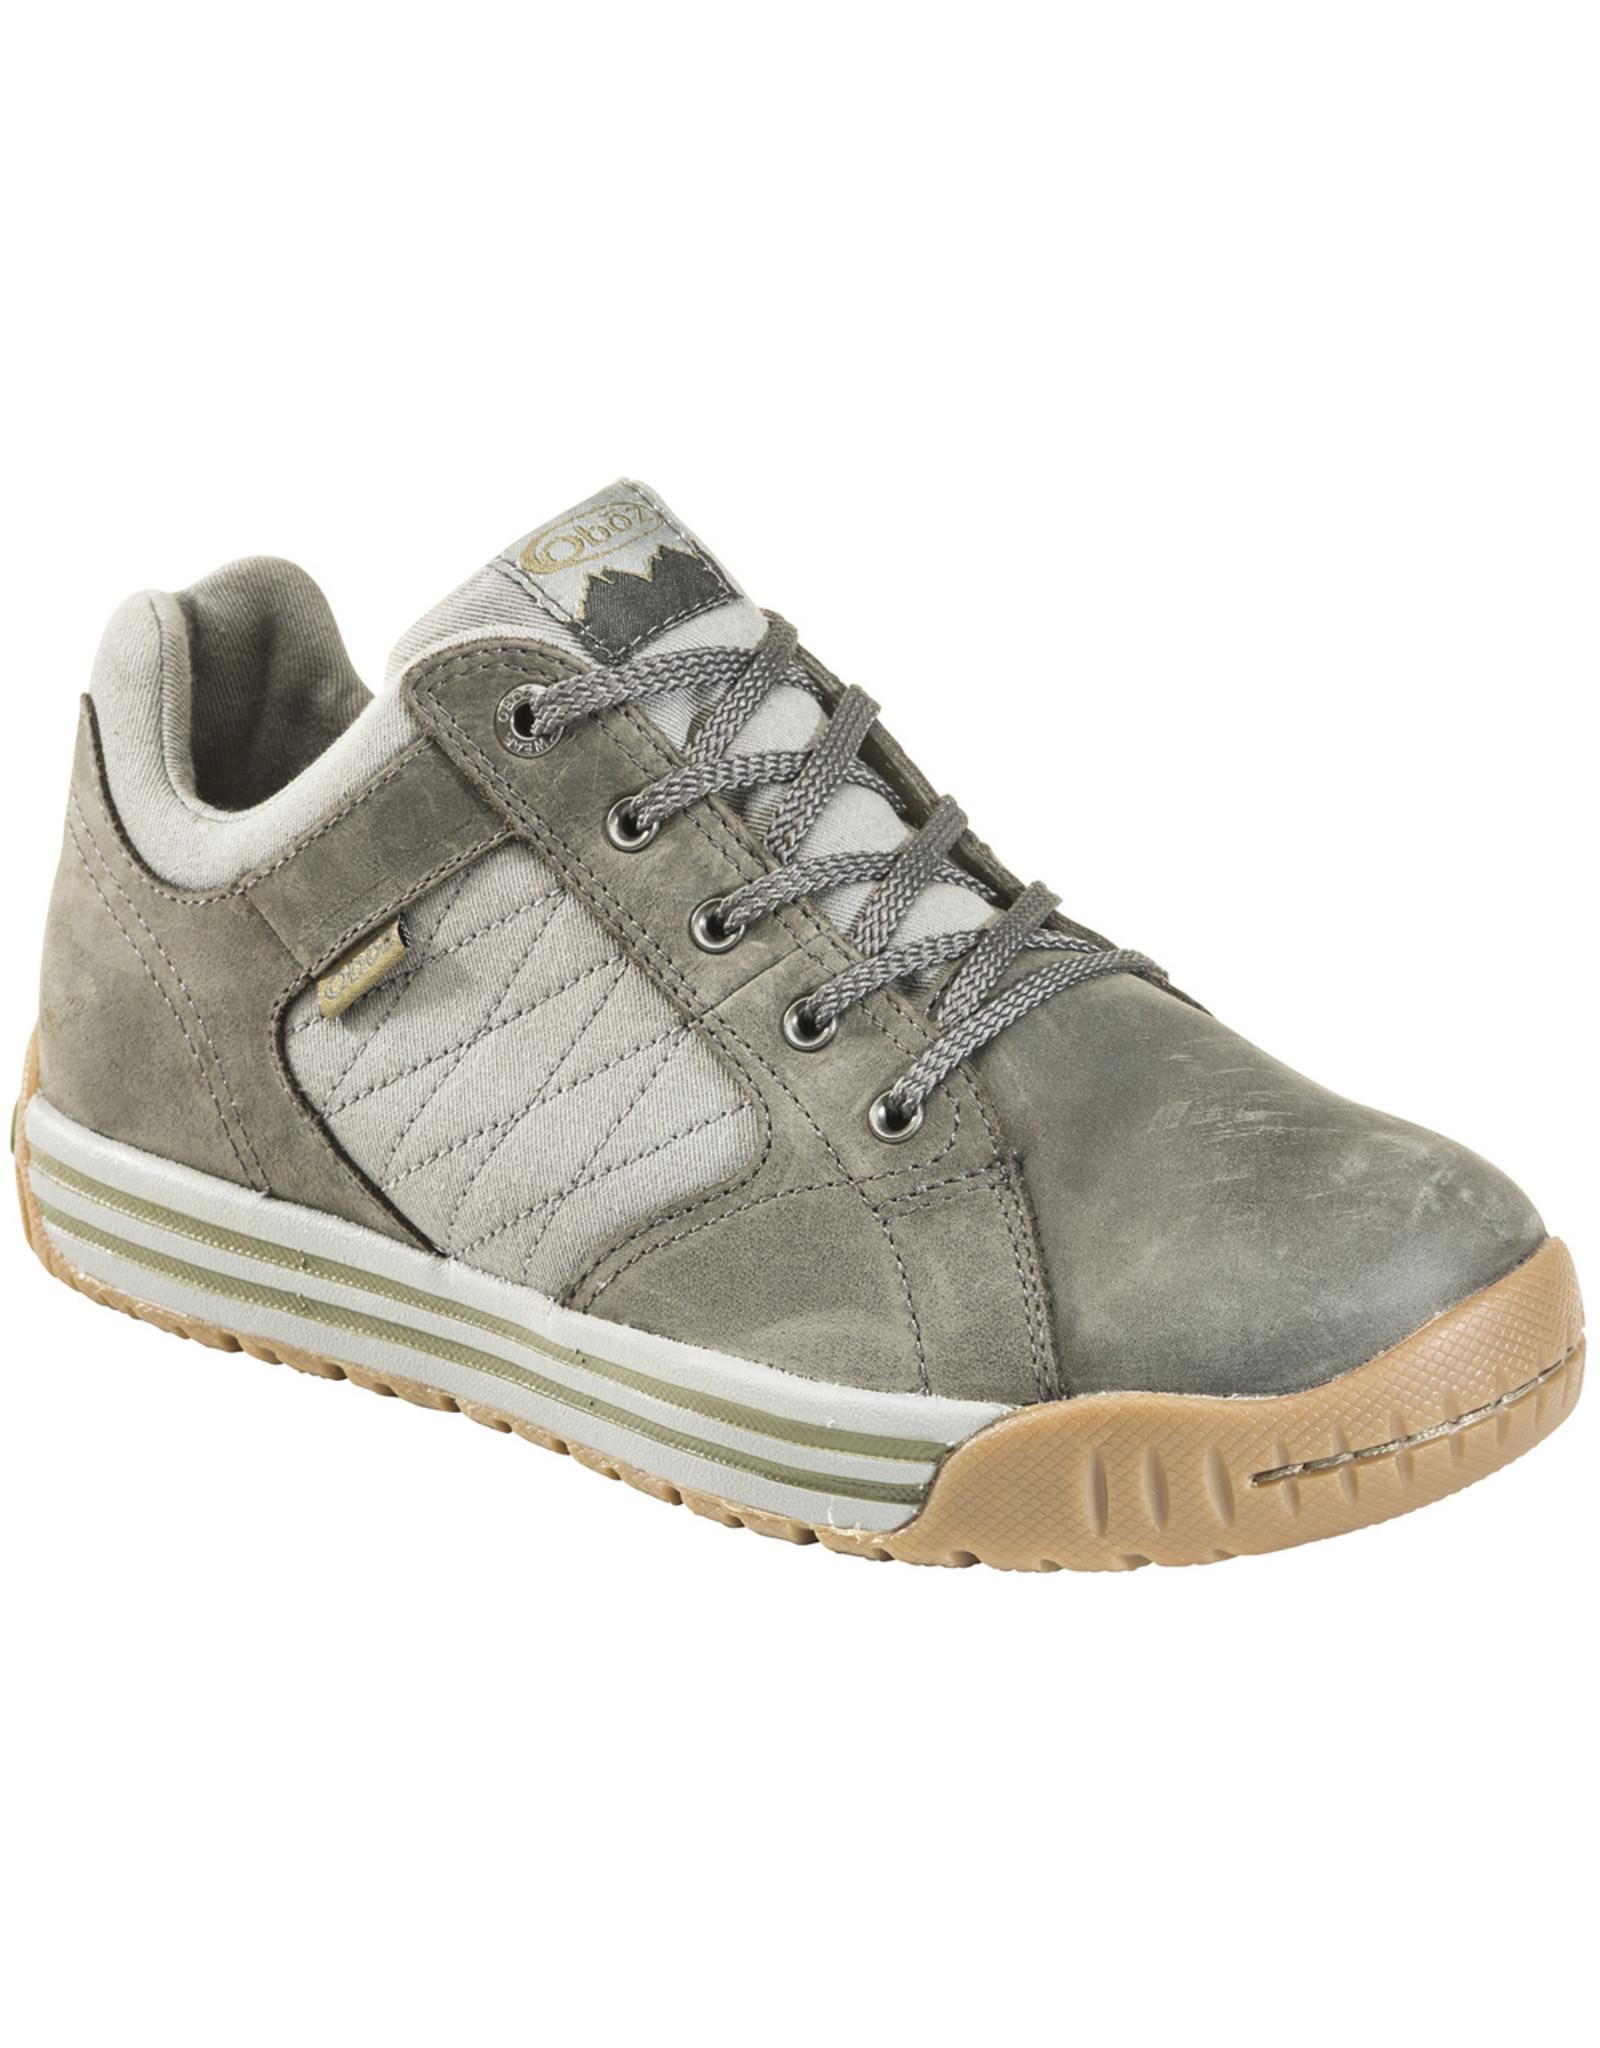 Oboz Oboz Mendenhall Shoe - Men's